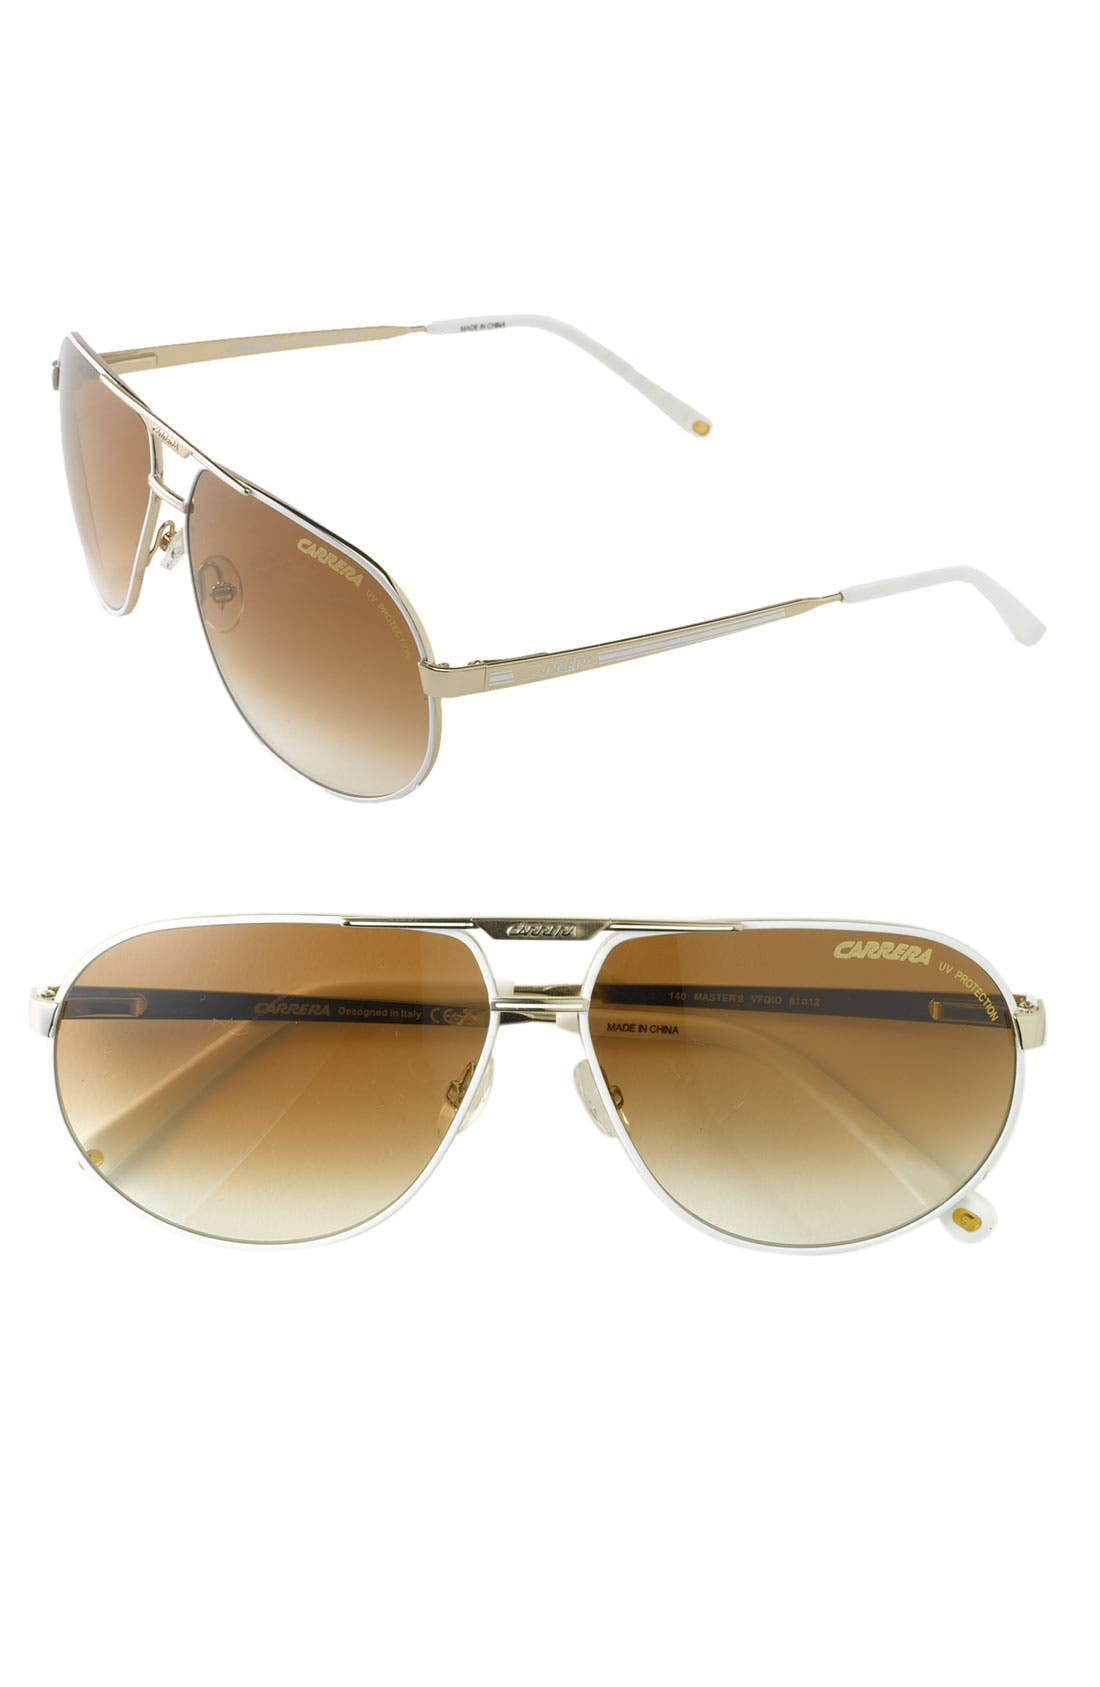 Alternate Image 1 Selected - Carrera Eyewear 'Master 2' 61mm Classic Metal Aviator Sunglasses